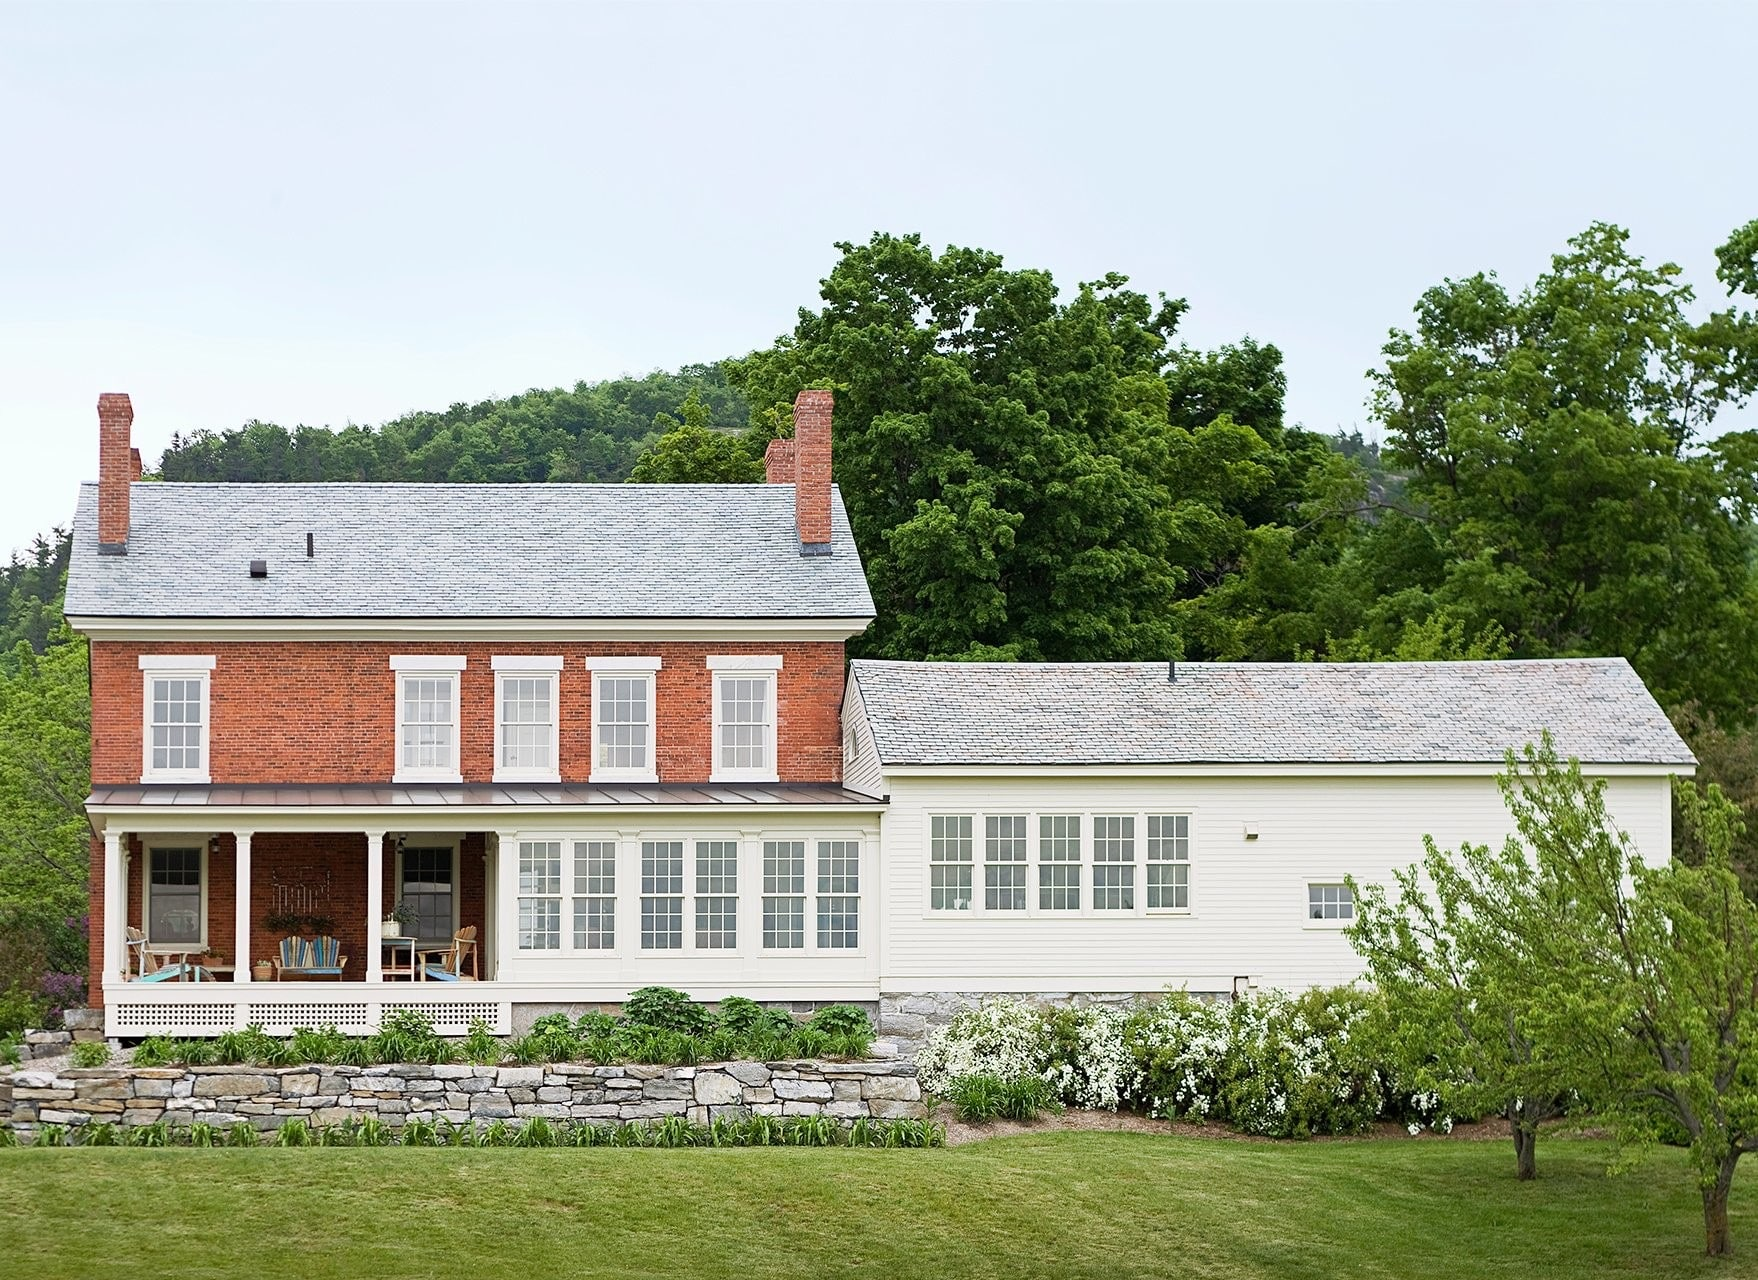 44. Desain Rumah Impian Model Villa Sederhana - Thegorbalsla